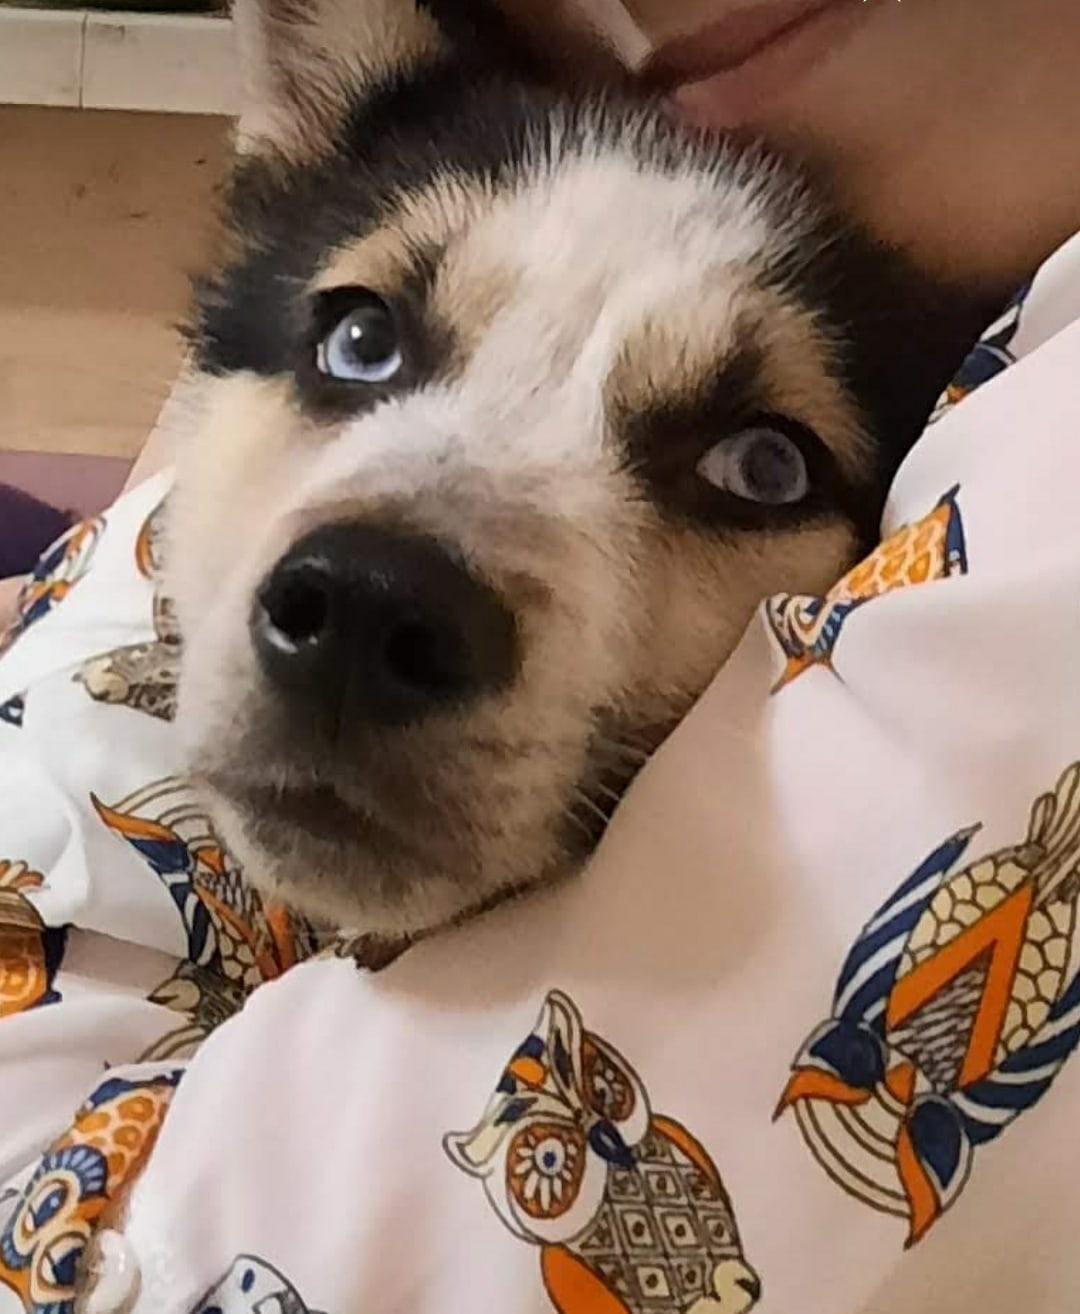 Потерялась собака хаски в районе 26/15 зовут панда